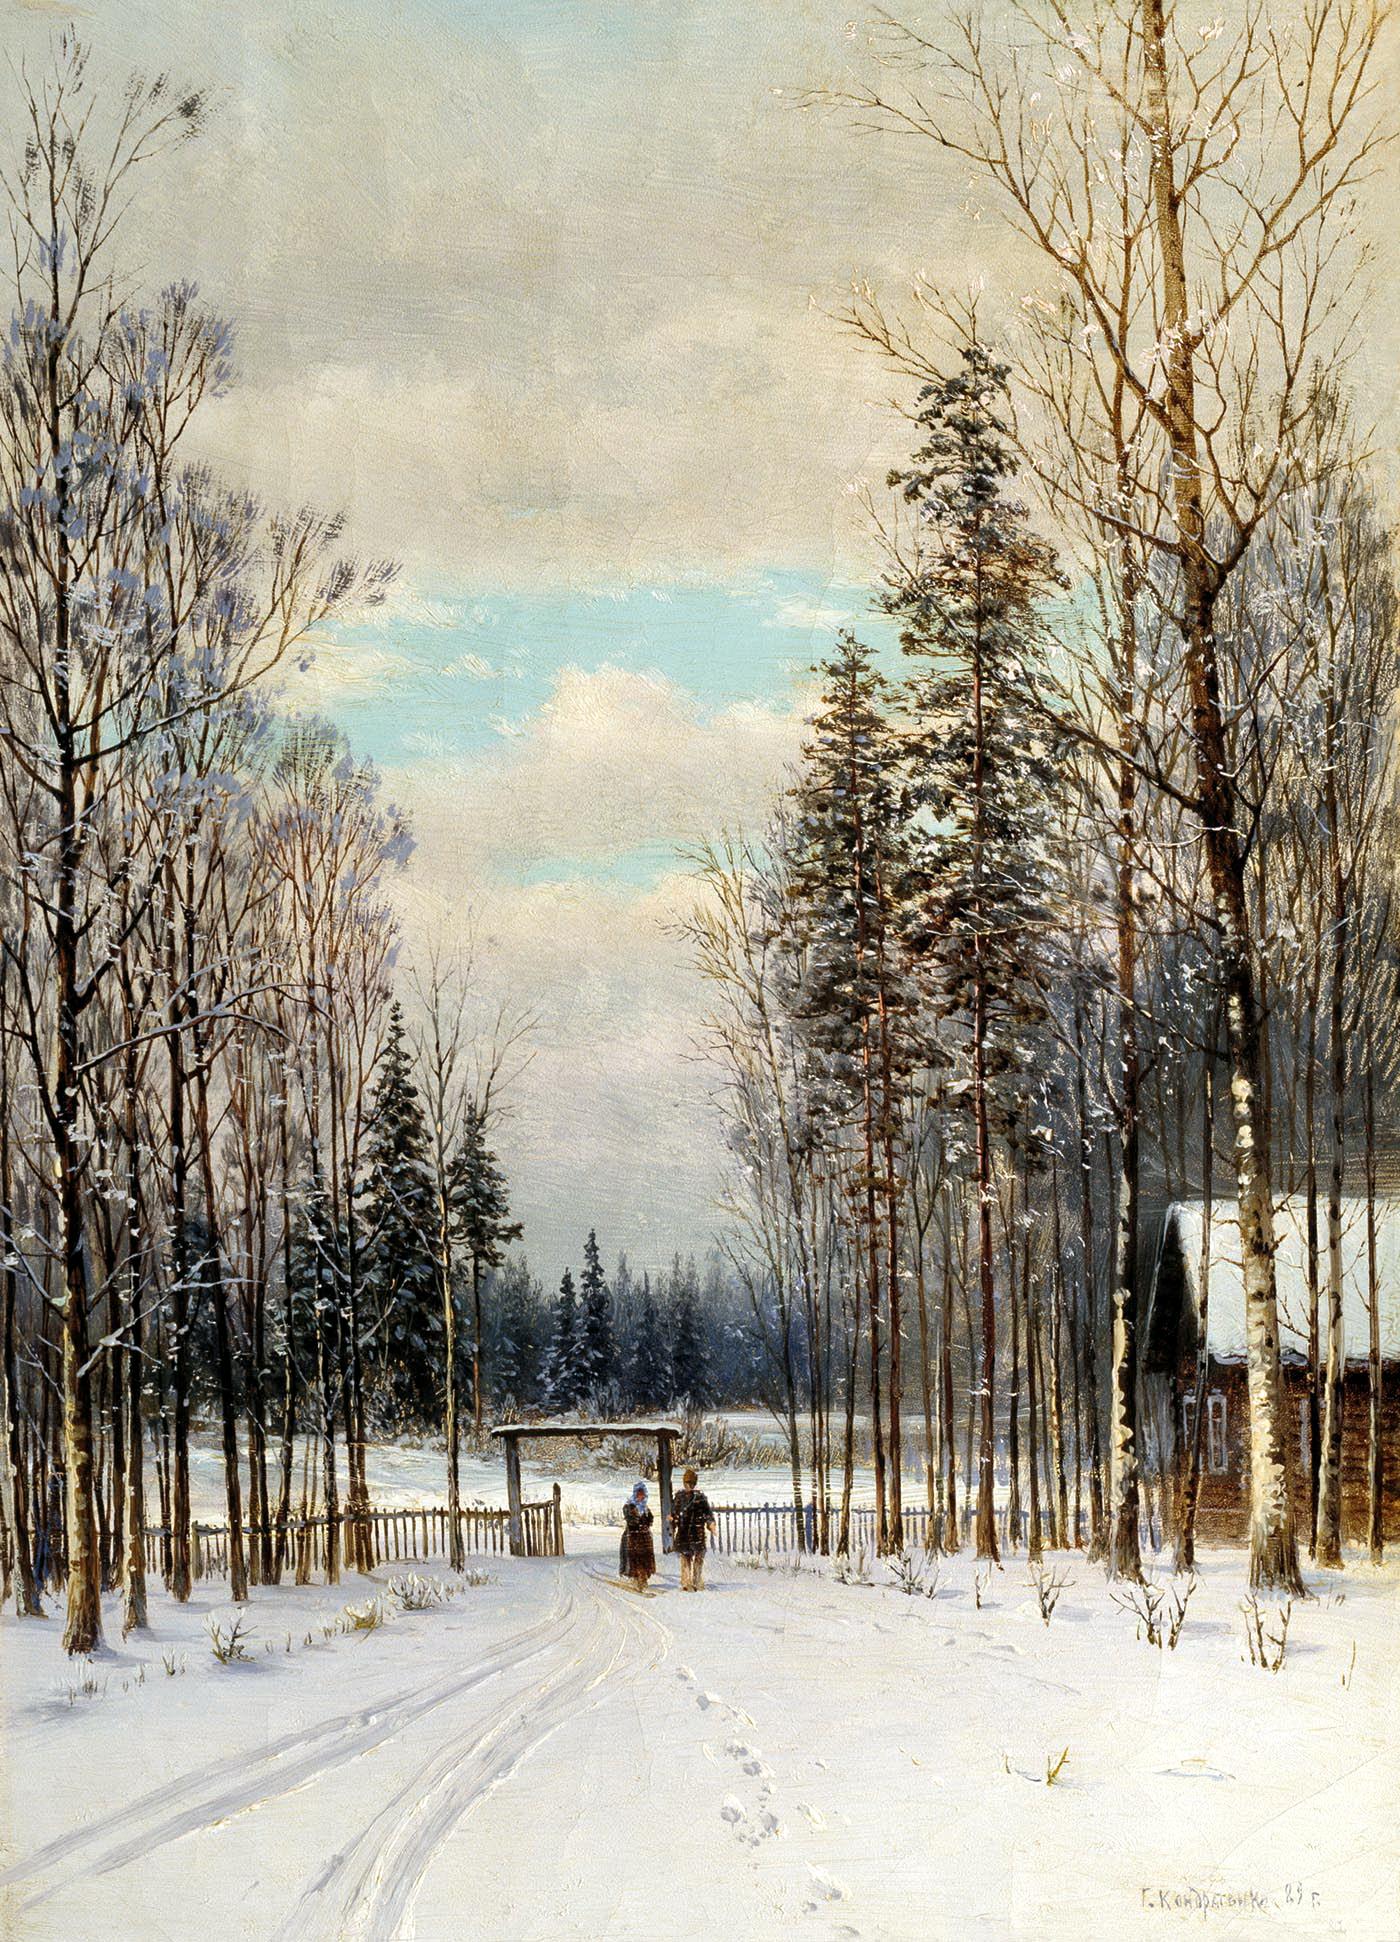 Гавриил Кондратенко картина Зима зимний пейзаж холст масло